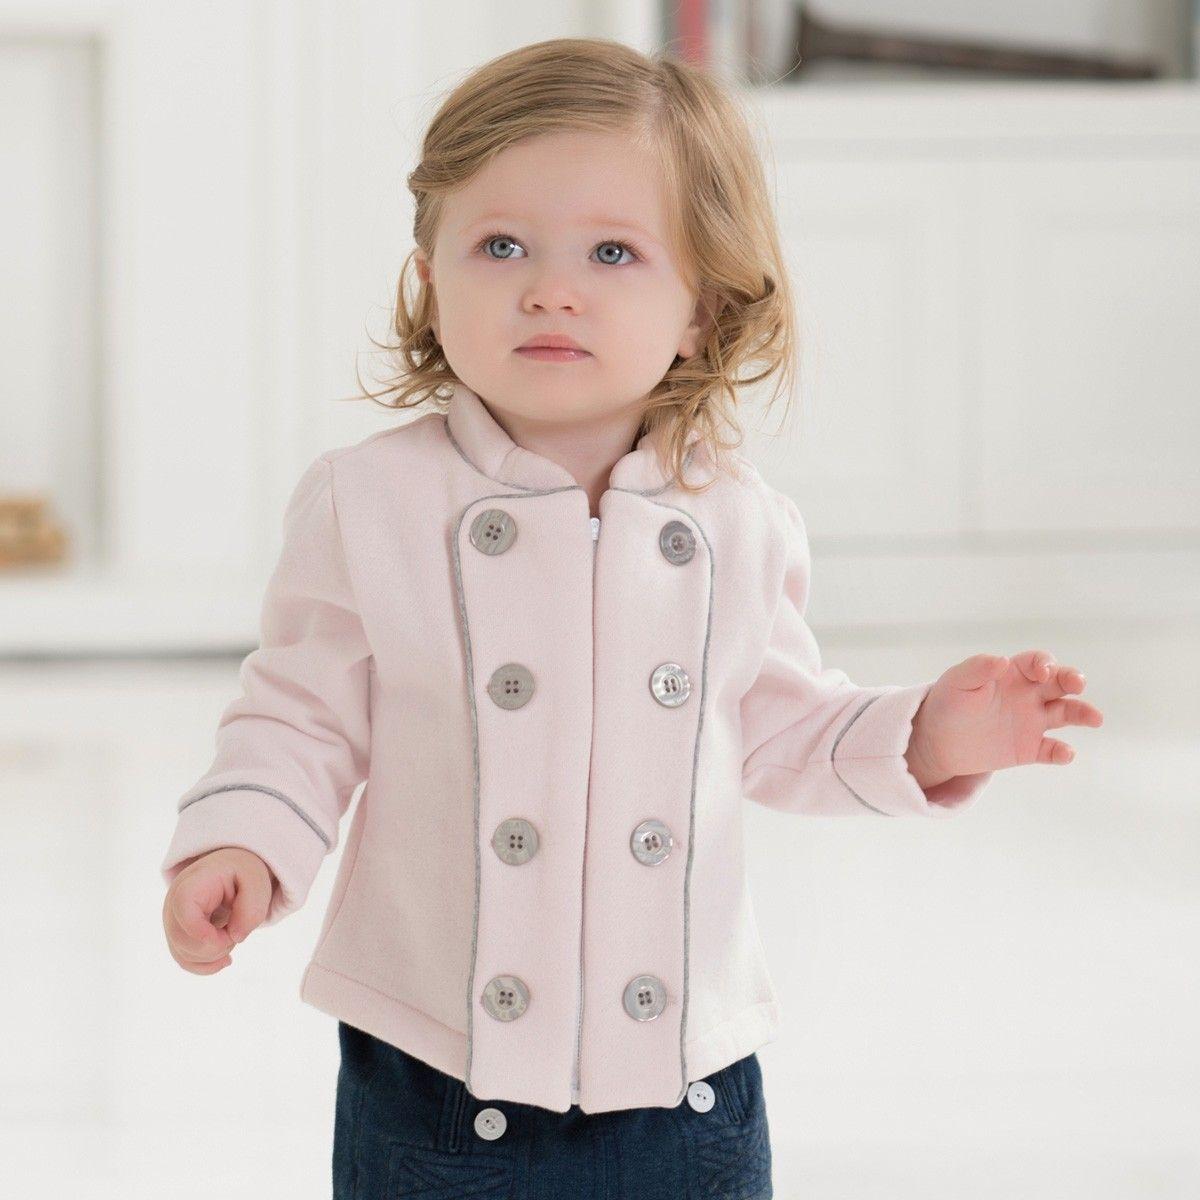 6fff1ec3aec1 Baby Coat for baby girl - Coats and Jackets - Baby girls